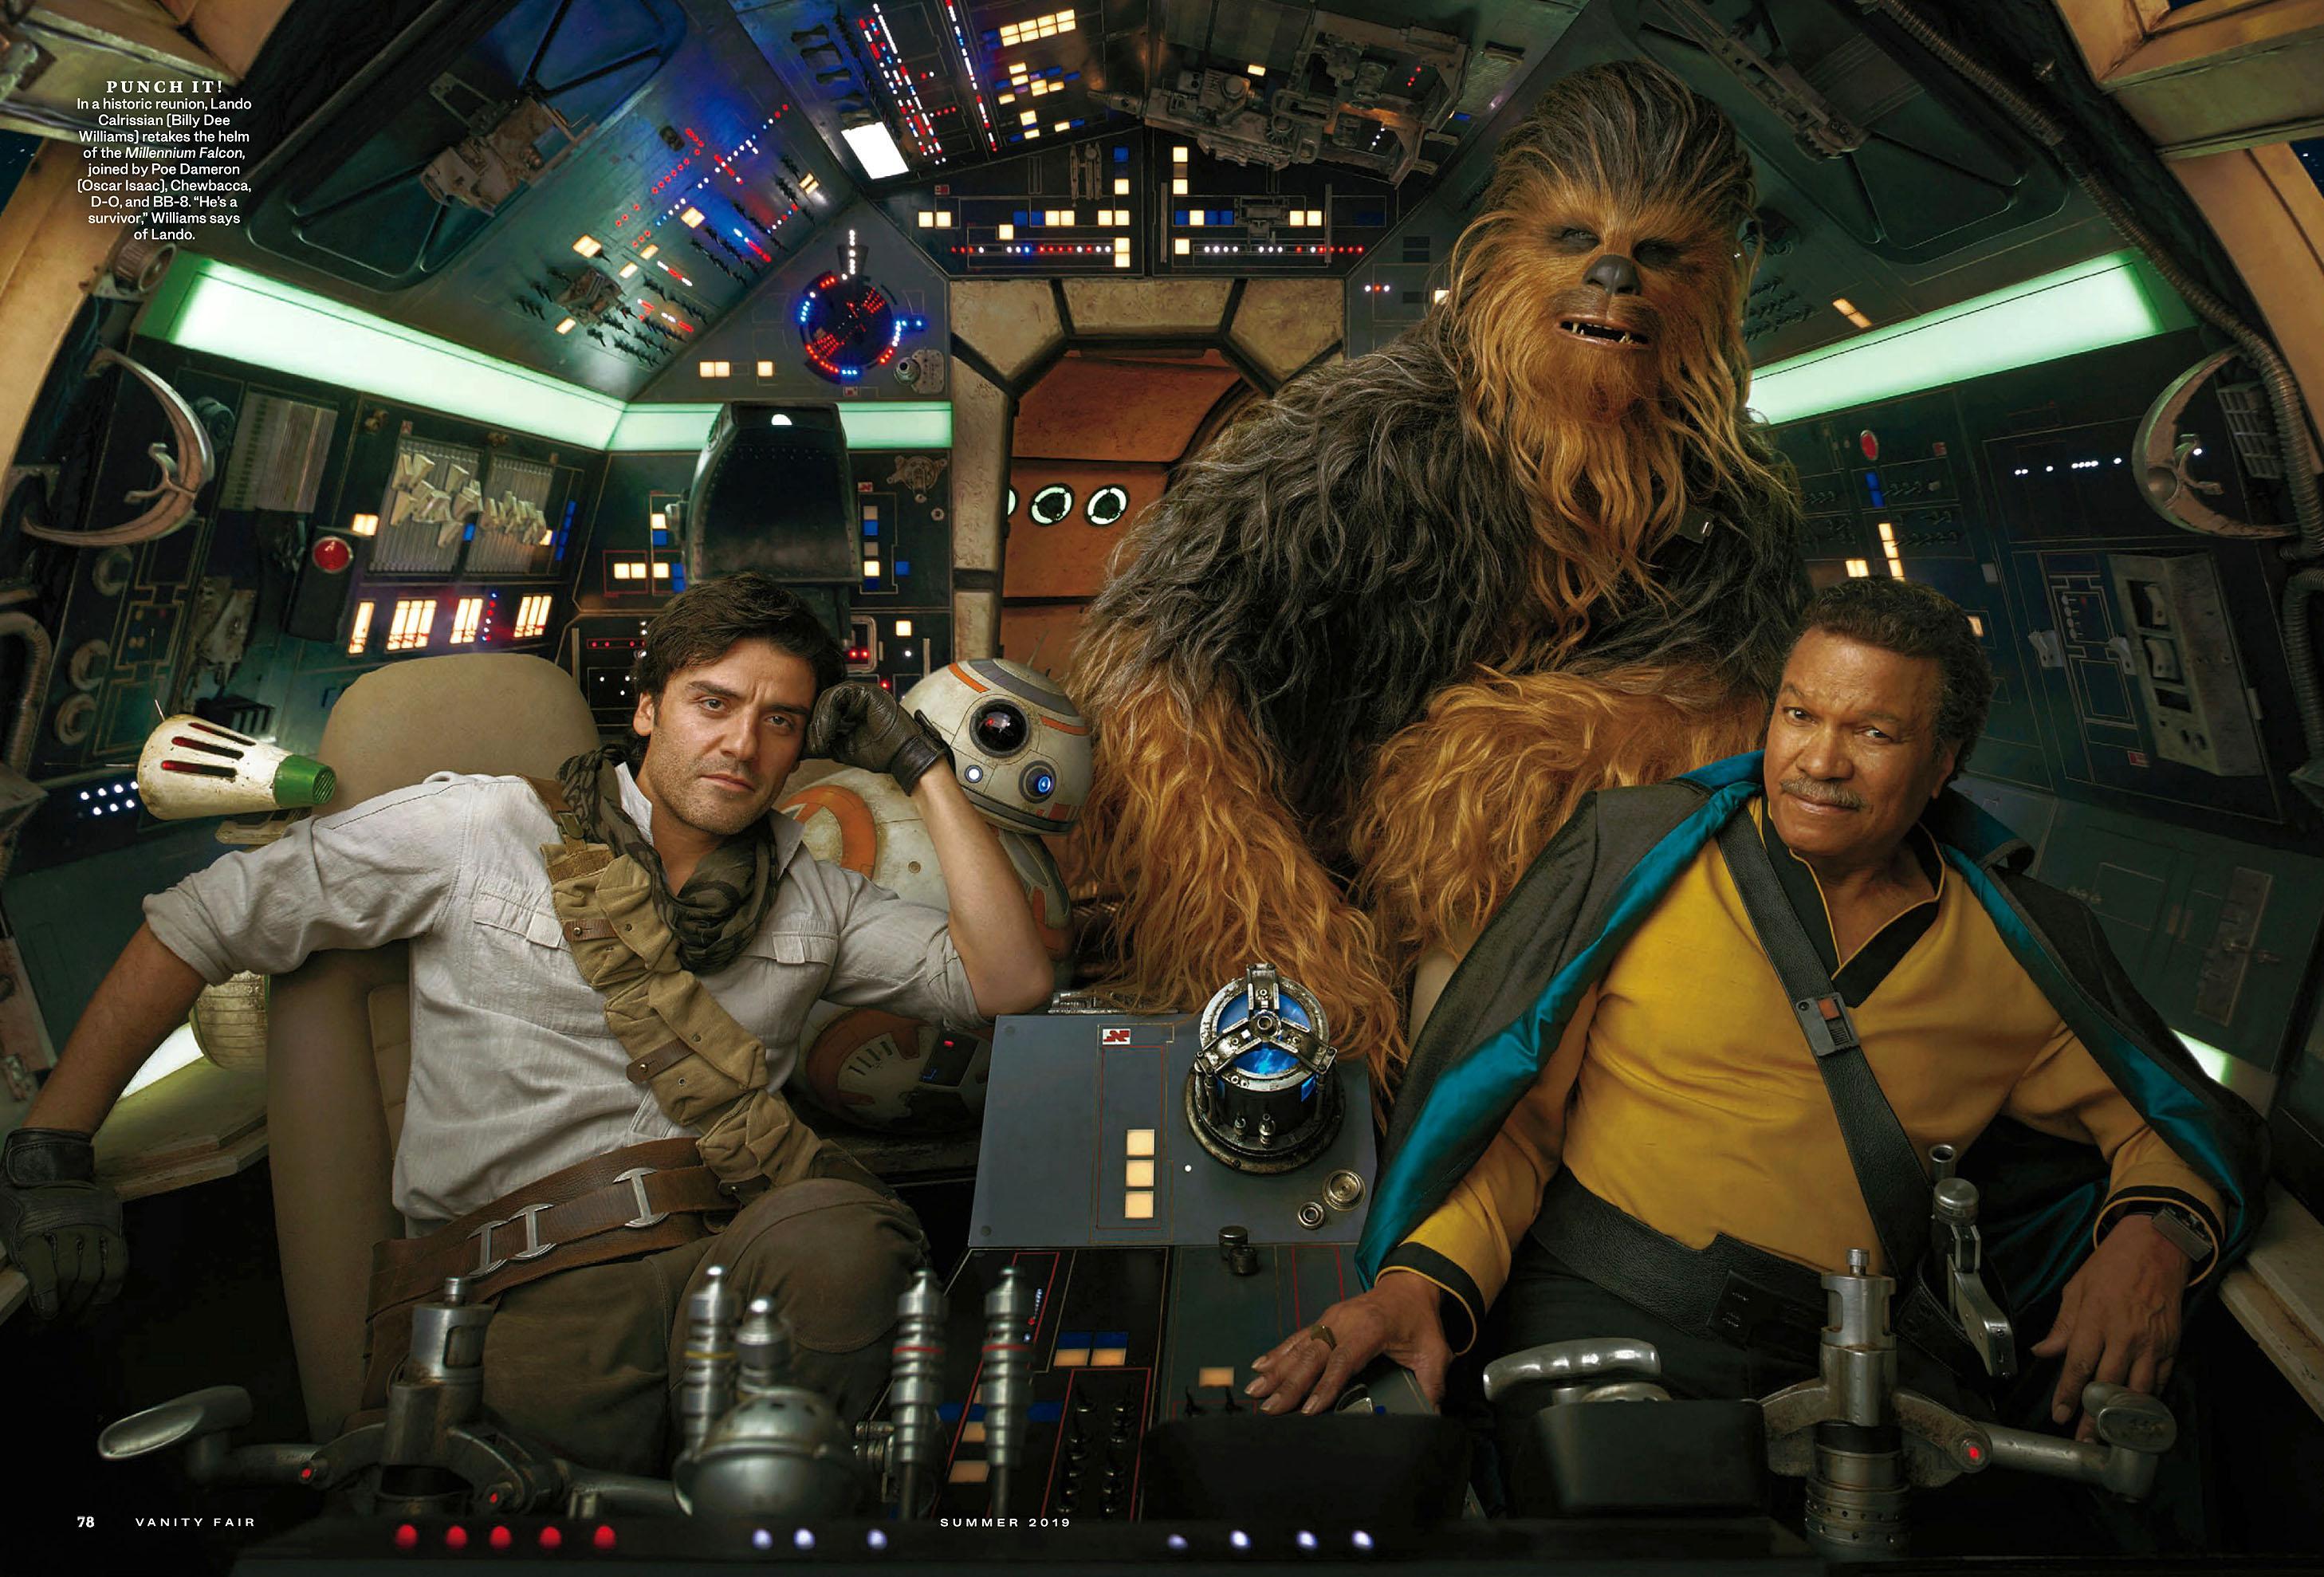 Vanity Fair Summer 2019 Star Wars08.jpg